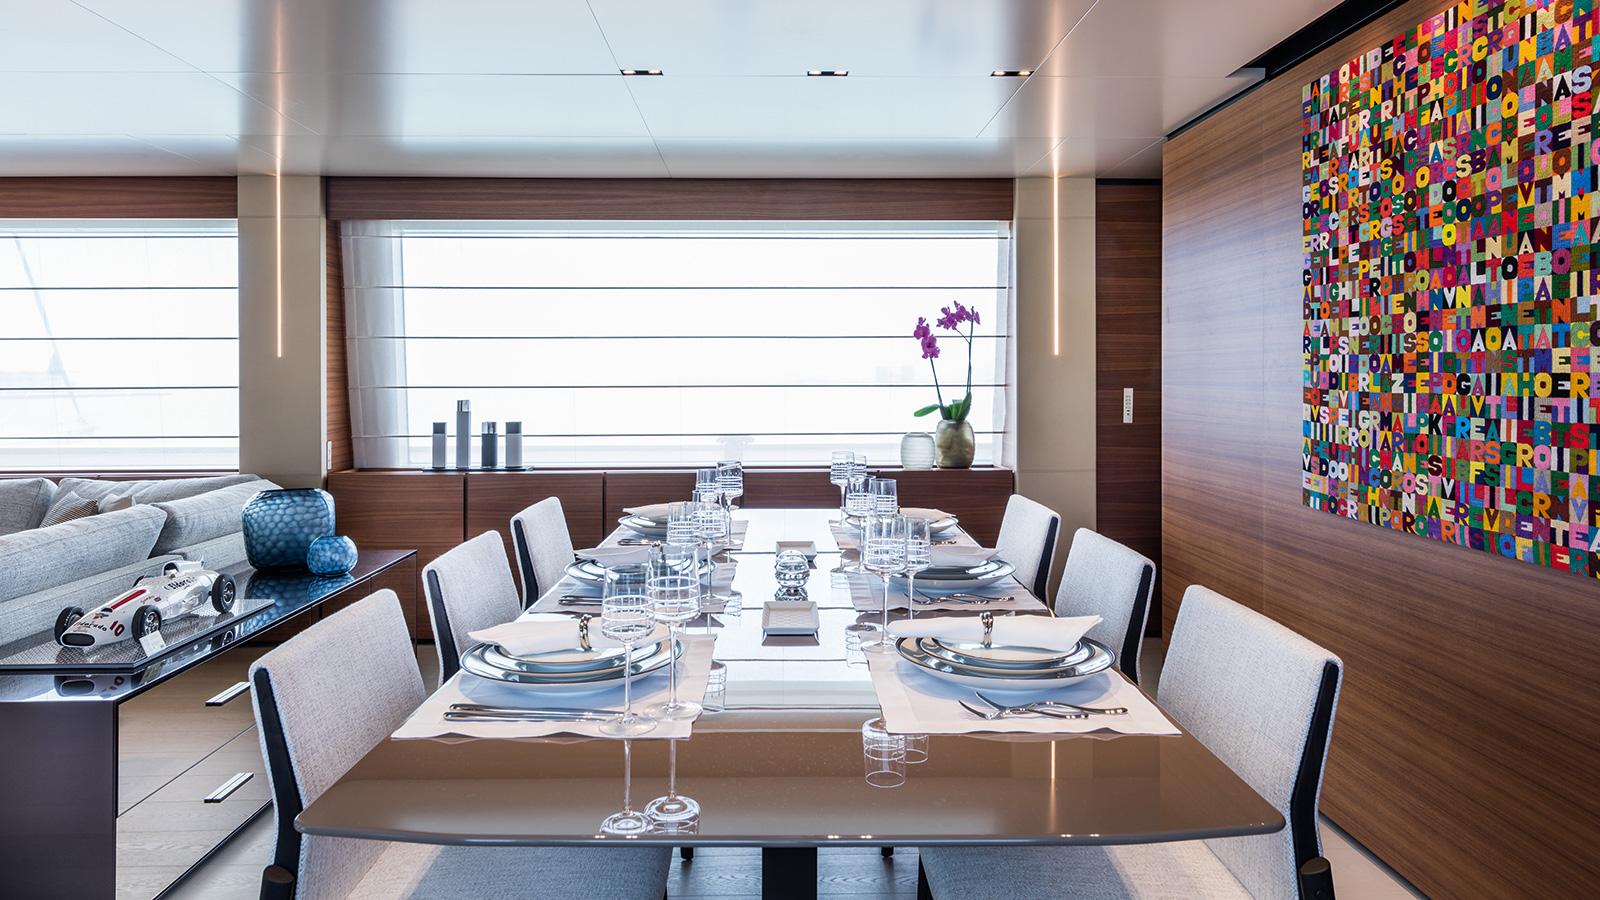 the-dining-area-of-the-ferretti-custom-line-motor-yacht-telli-credit-alberto-cocchi